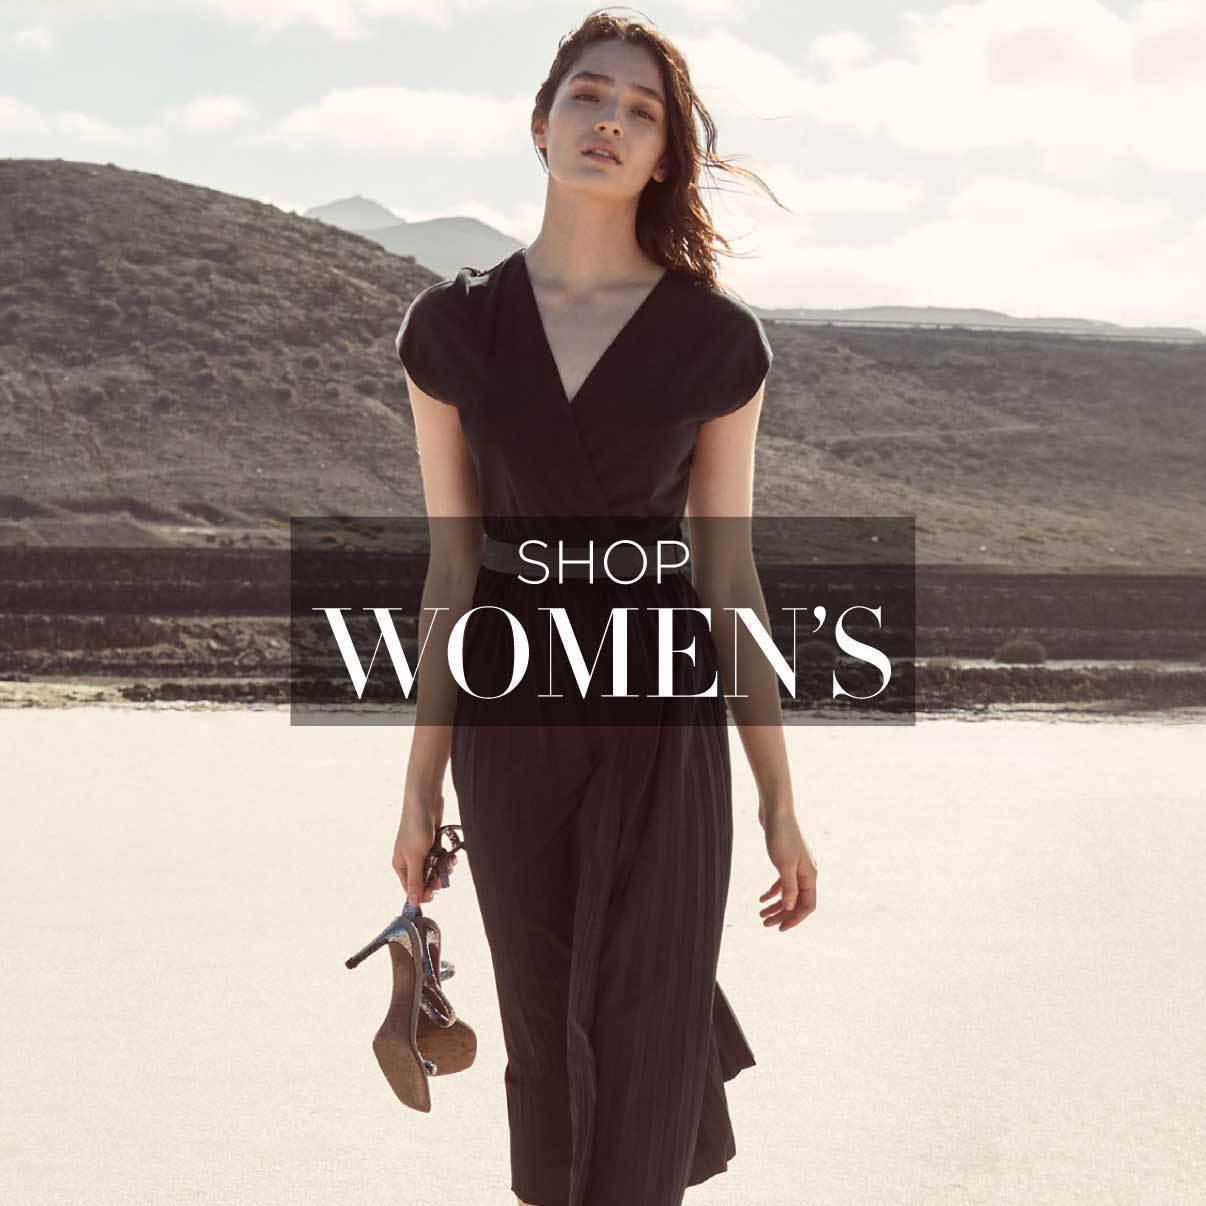 Shop designer women's clothing